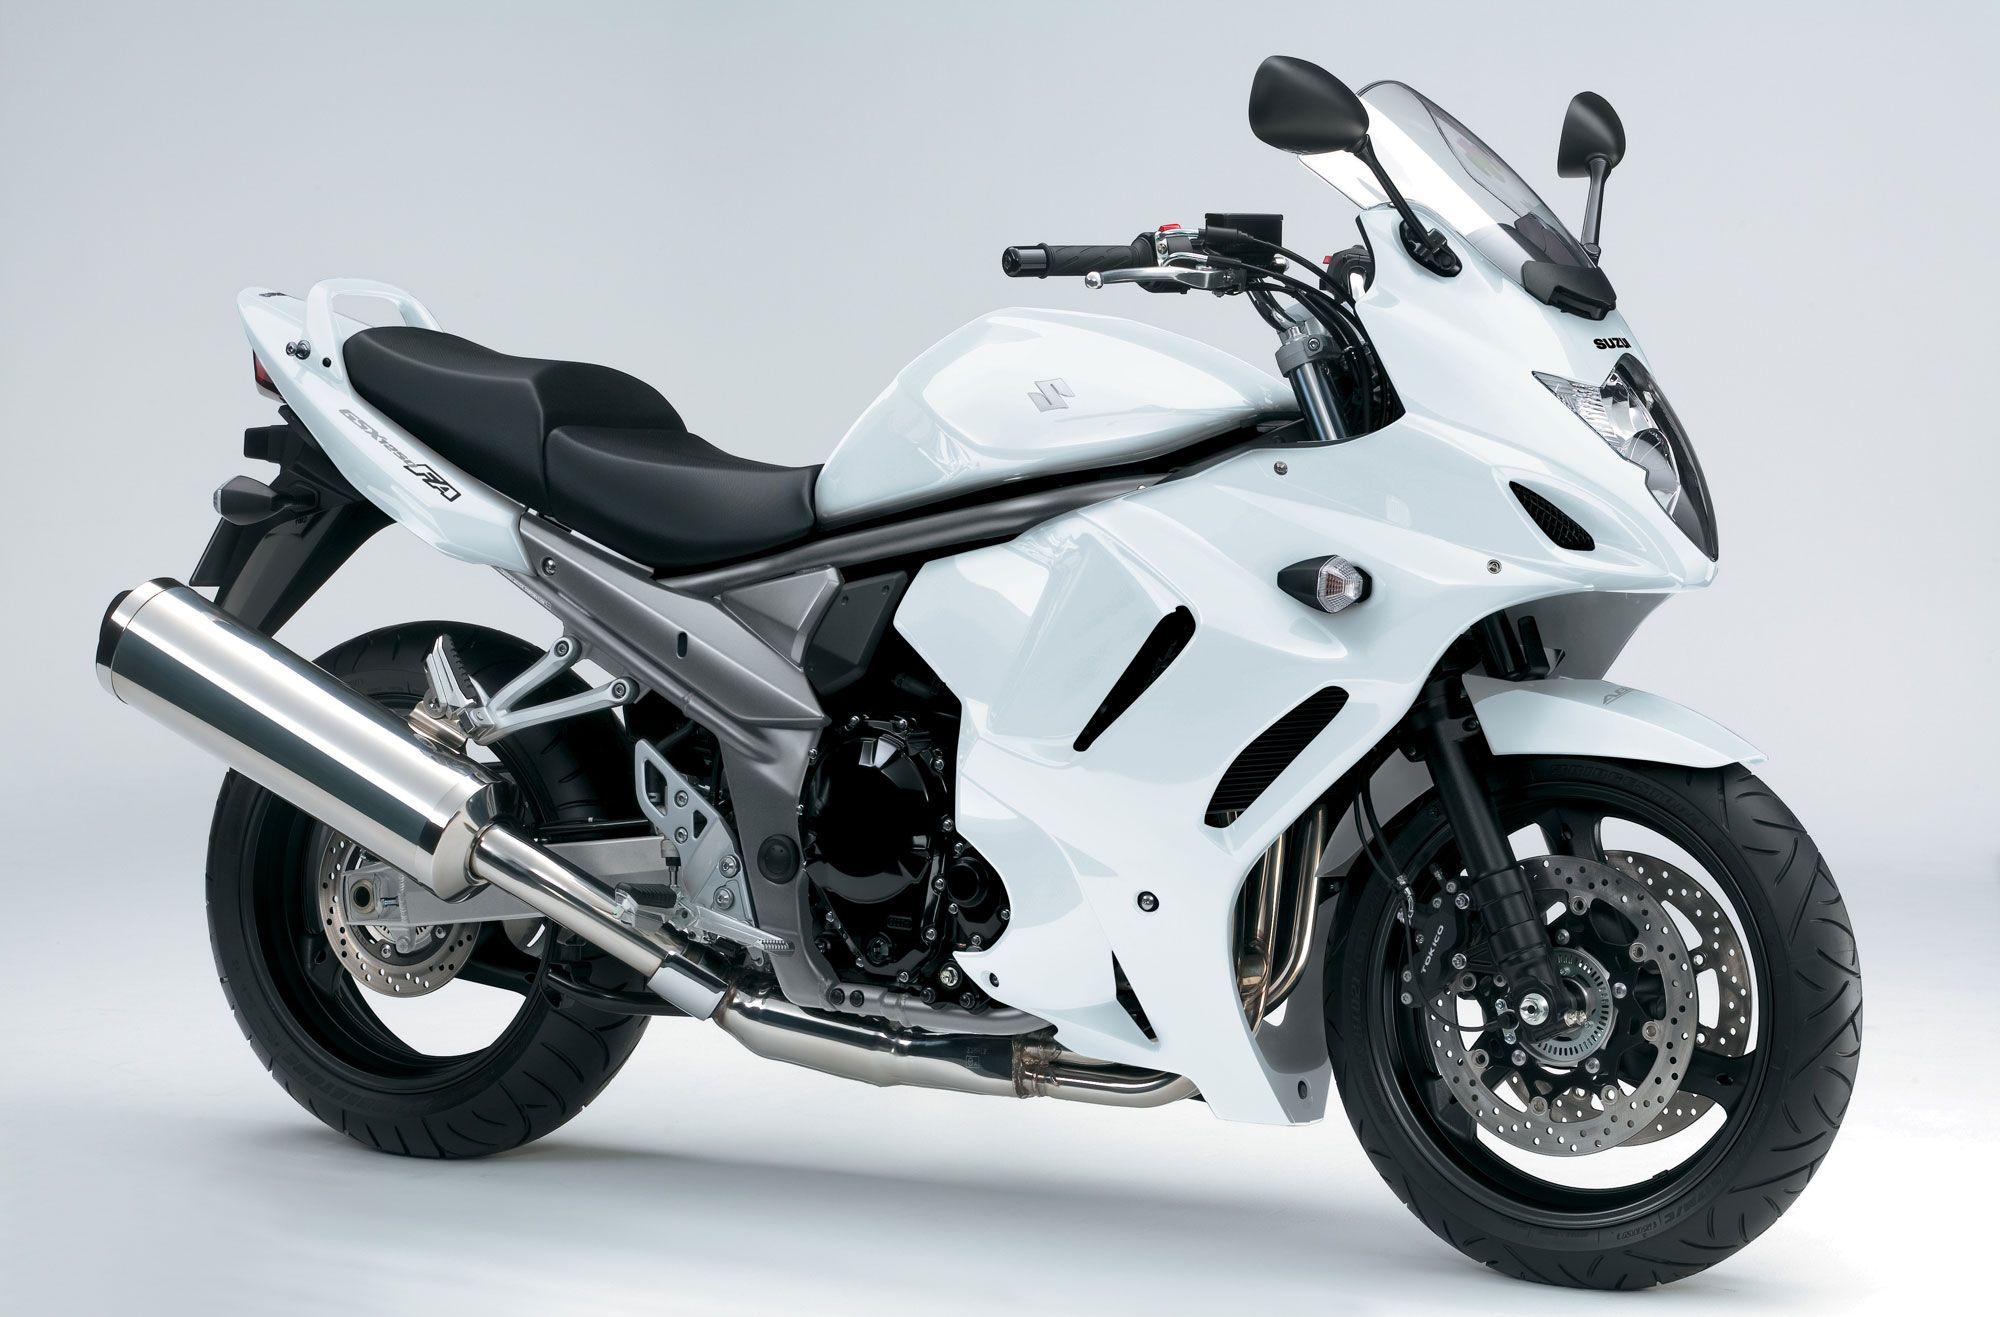 pin by m rio leonardo on motociclismo motorcycling pinterest rh pinterest co uk Suzuki GSX 1250 suzuki gsx 1250 fa workshop manual